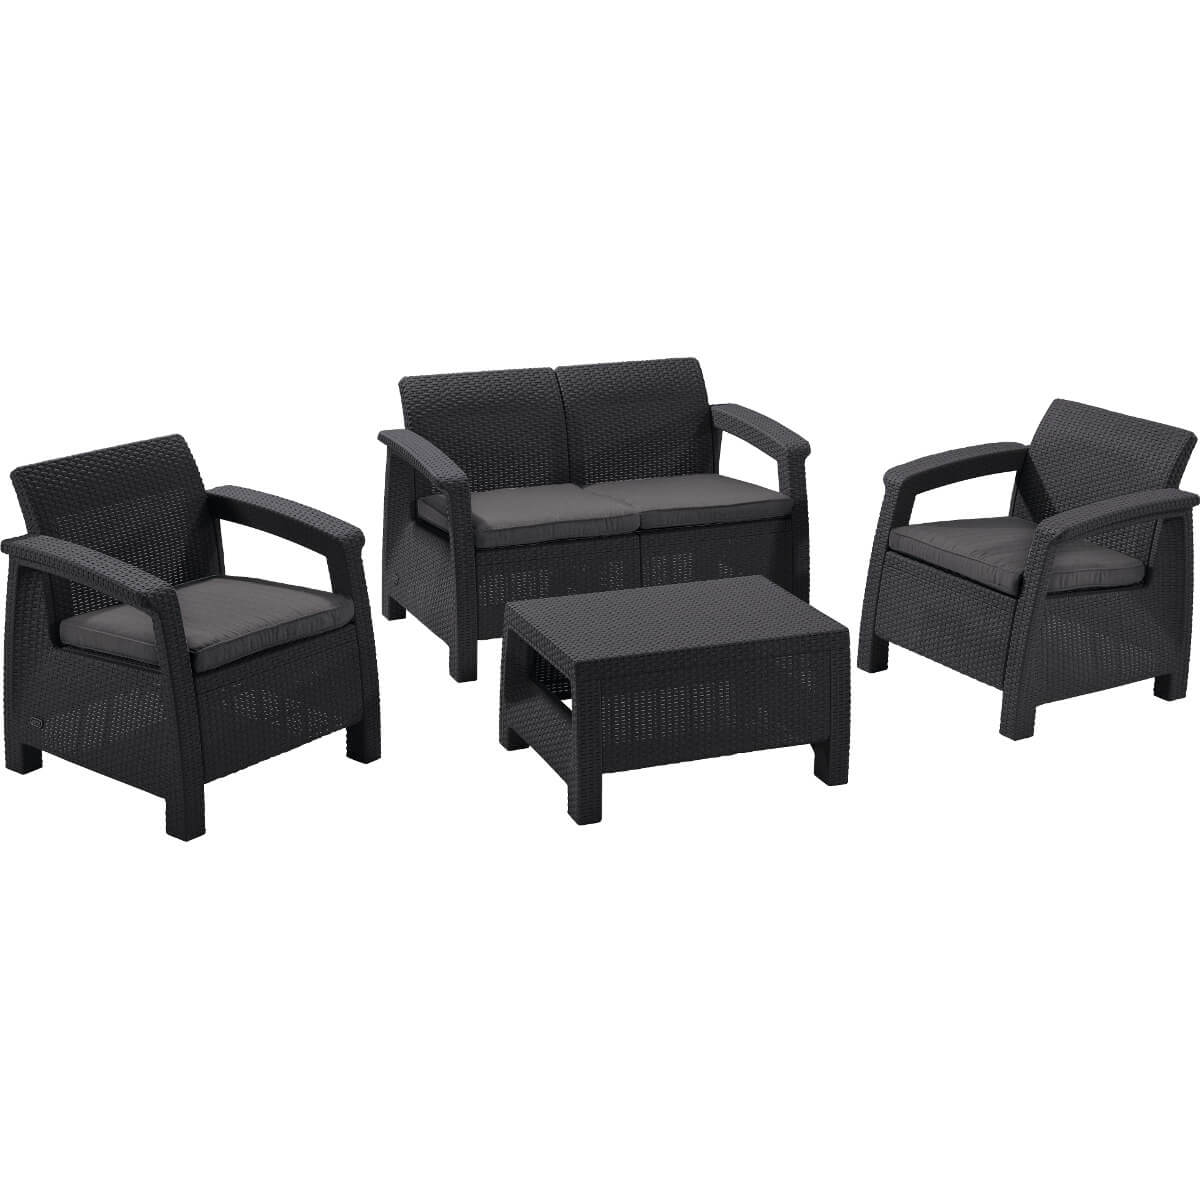 Комплект мебели Allibert Corfu 17197361